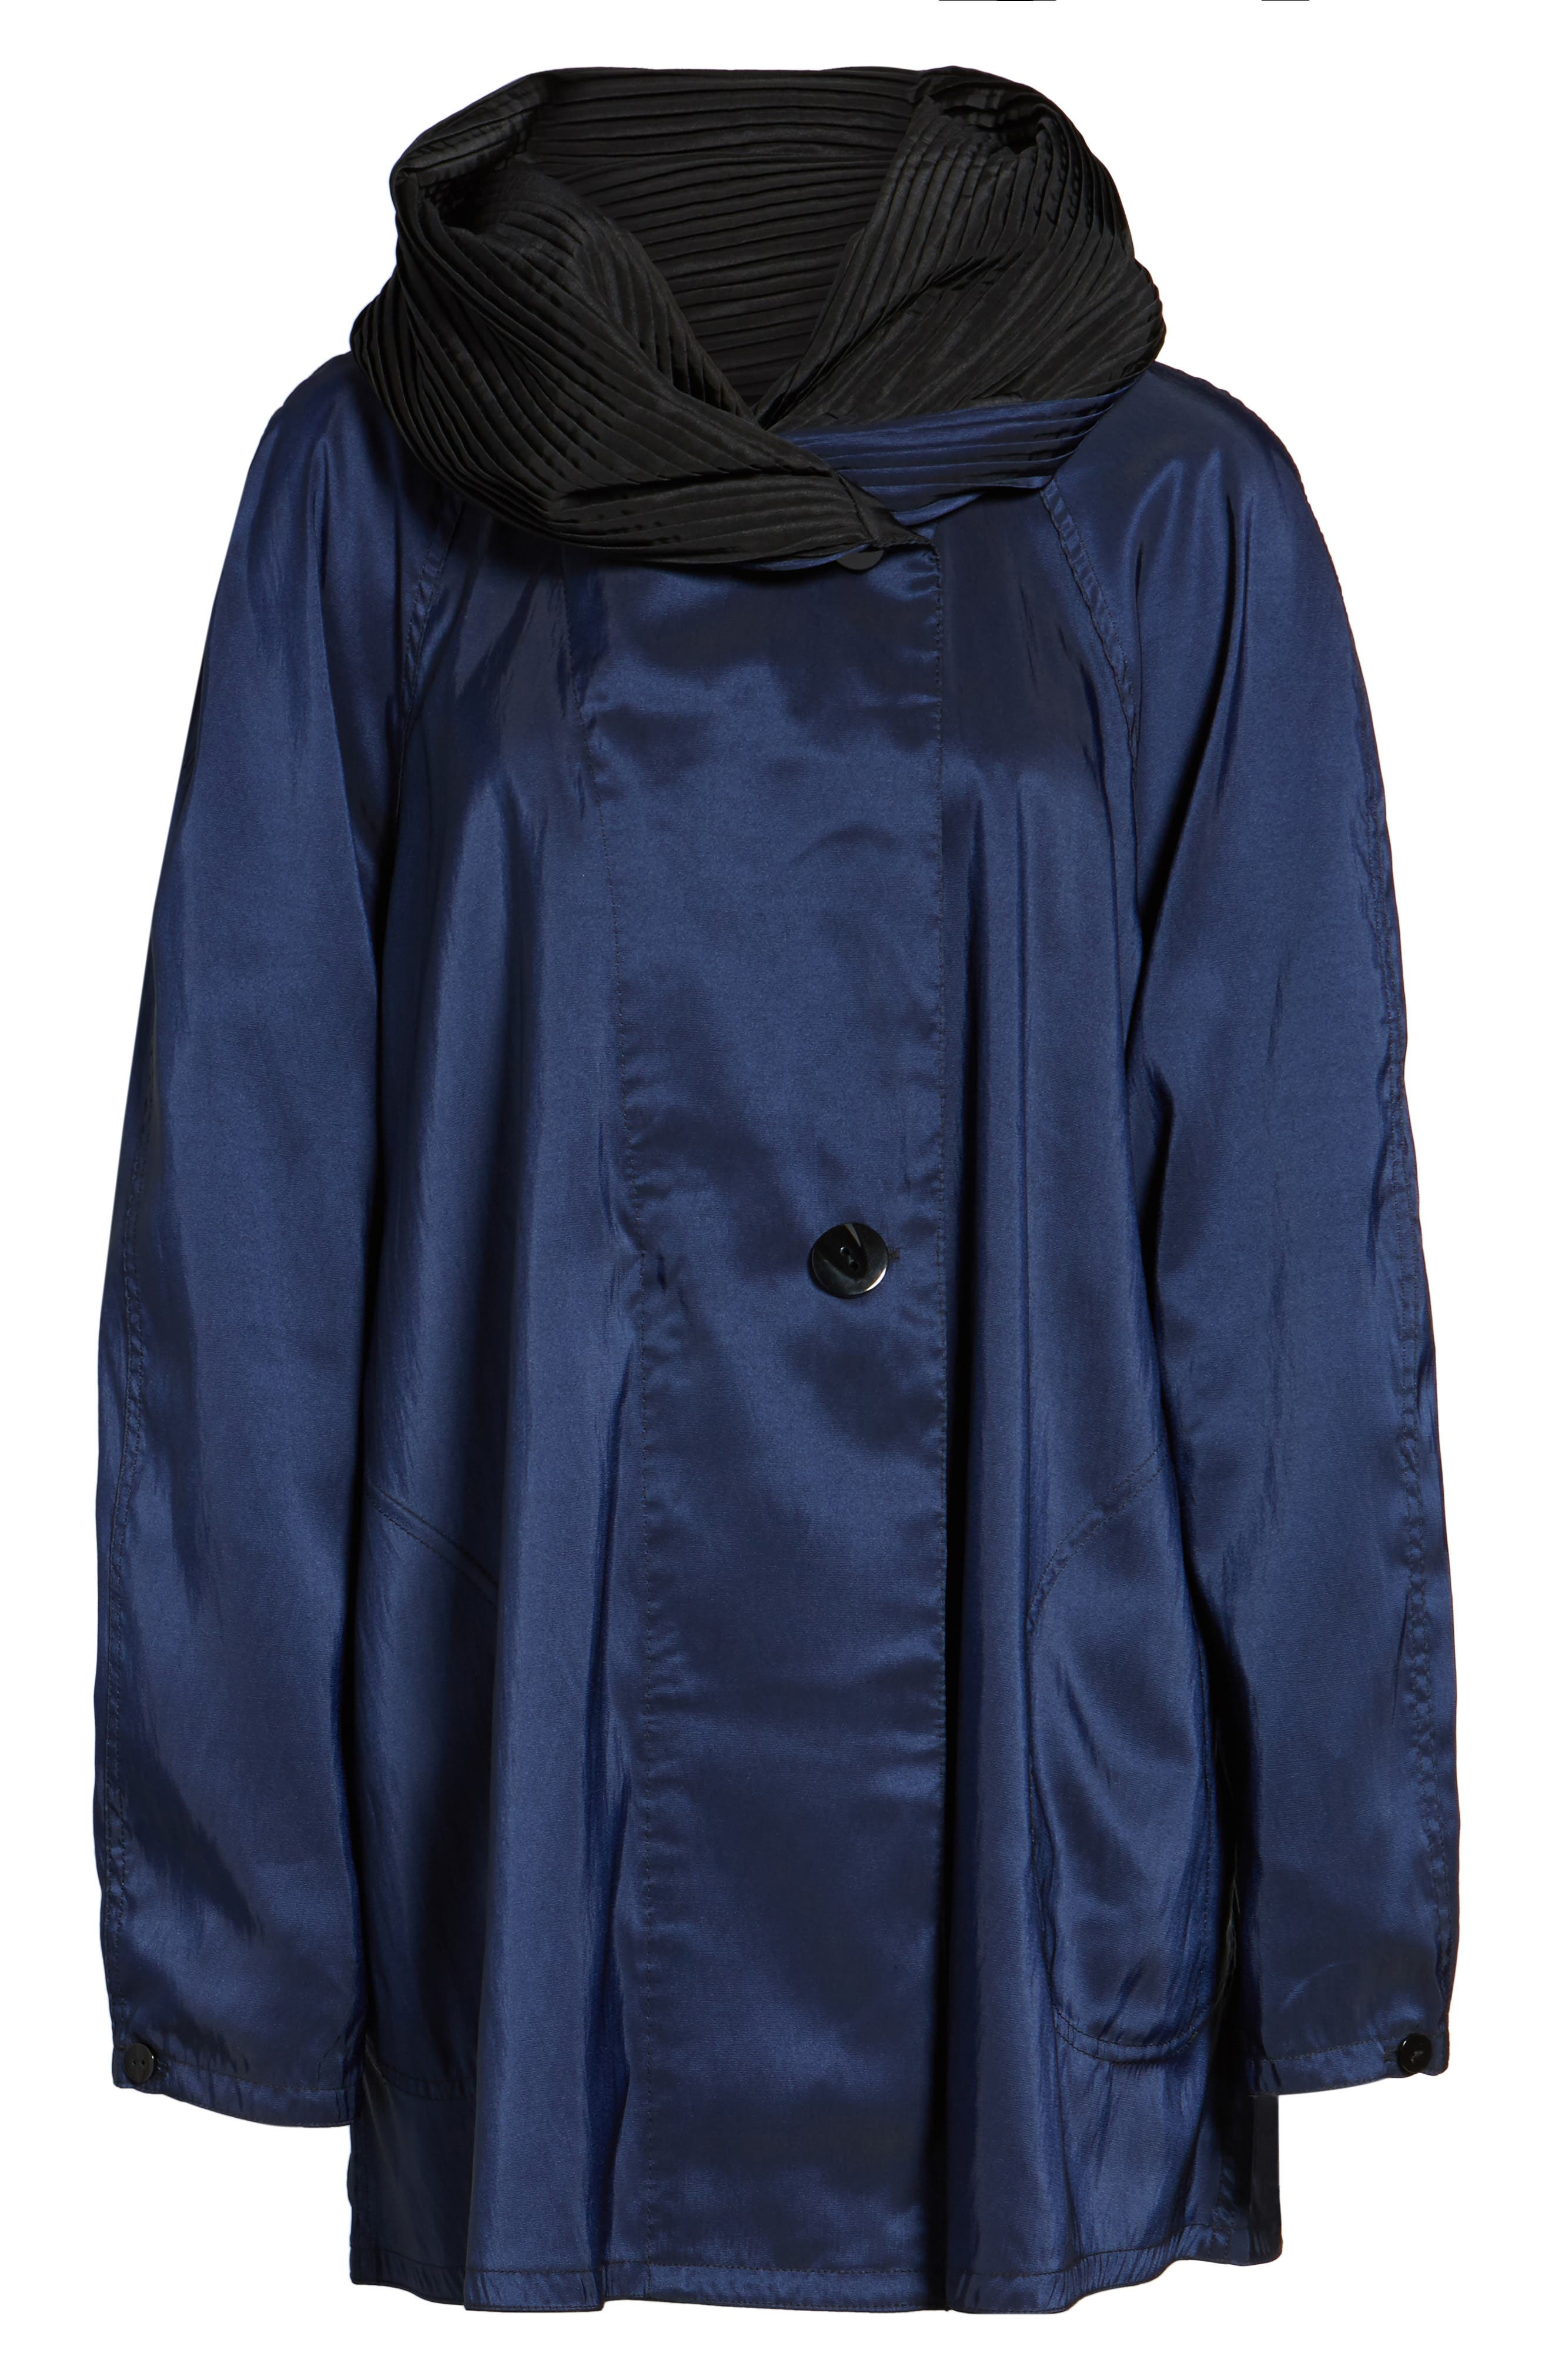 'Mini Donatella' Reversible Pleat Hood Packable Travel Coat,                             Alternate thumbnail 62, color,